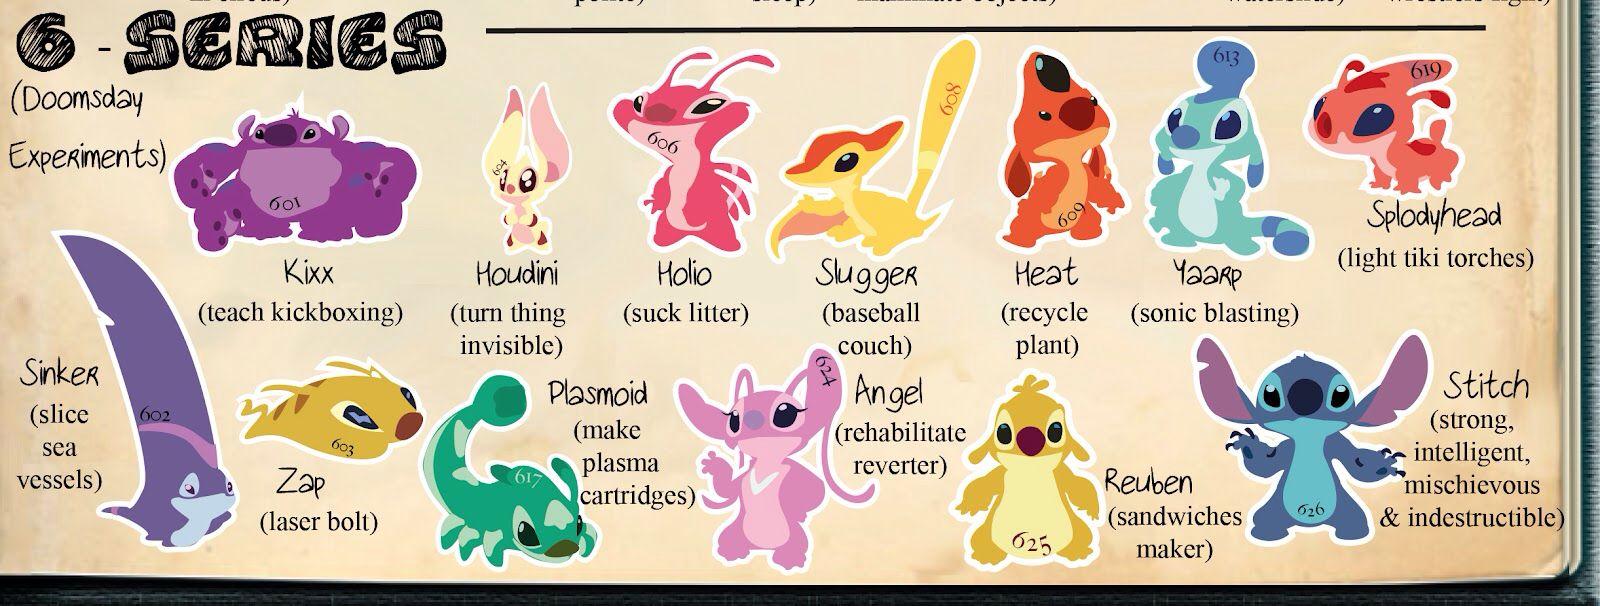 Doomsday cousins   Lilo and Stitch   Pinterest   Experimento y Primos